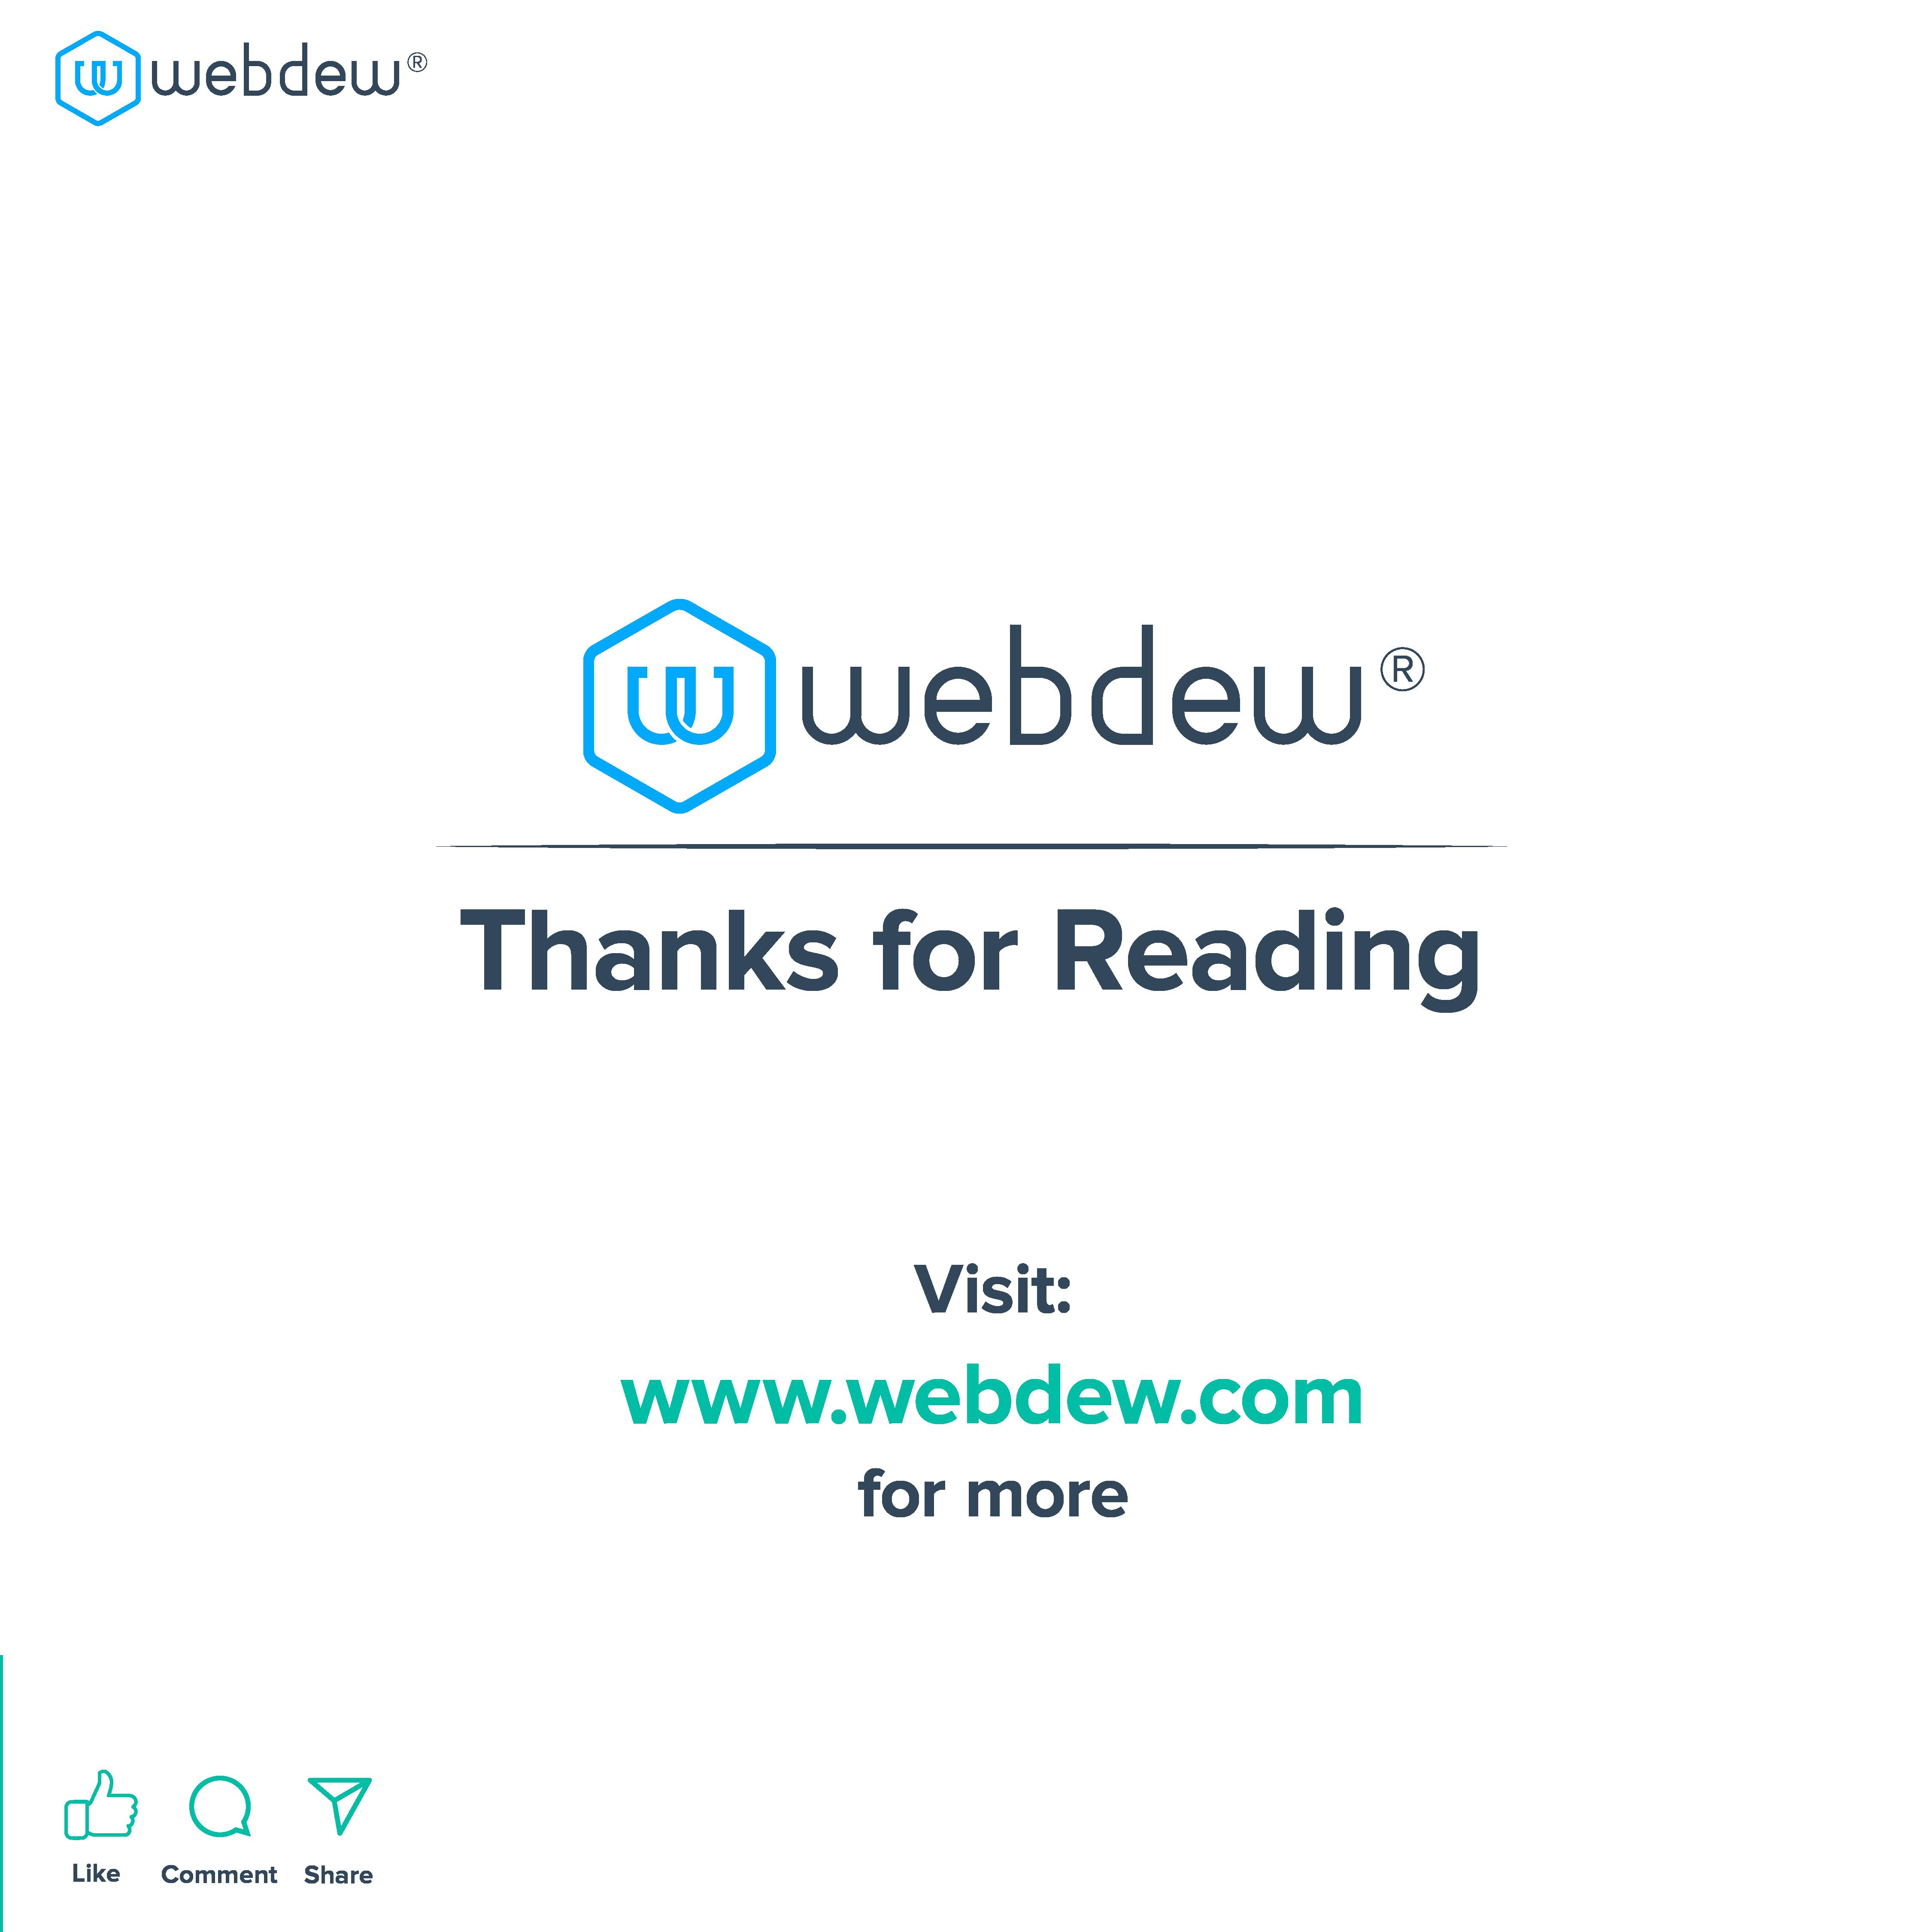 web-development-tool-thanks-for-reading